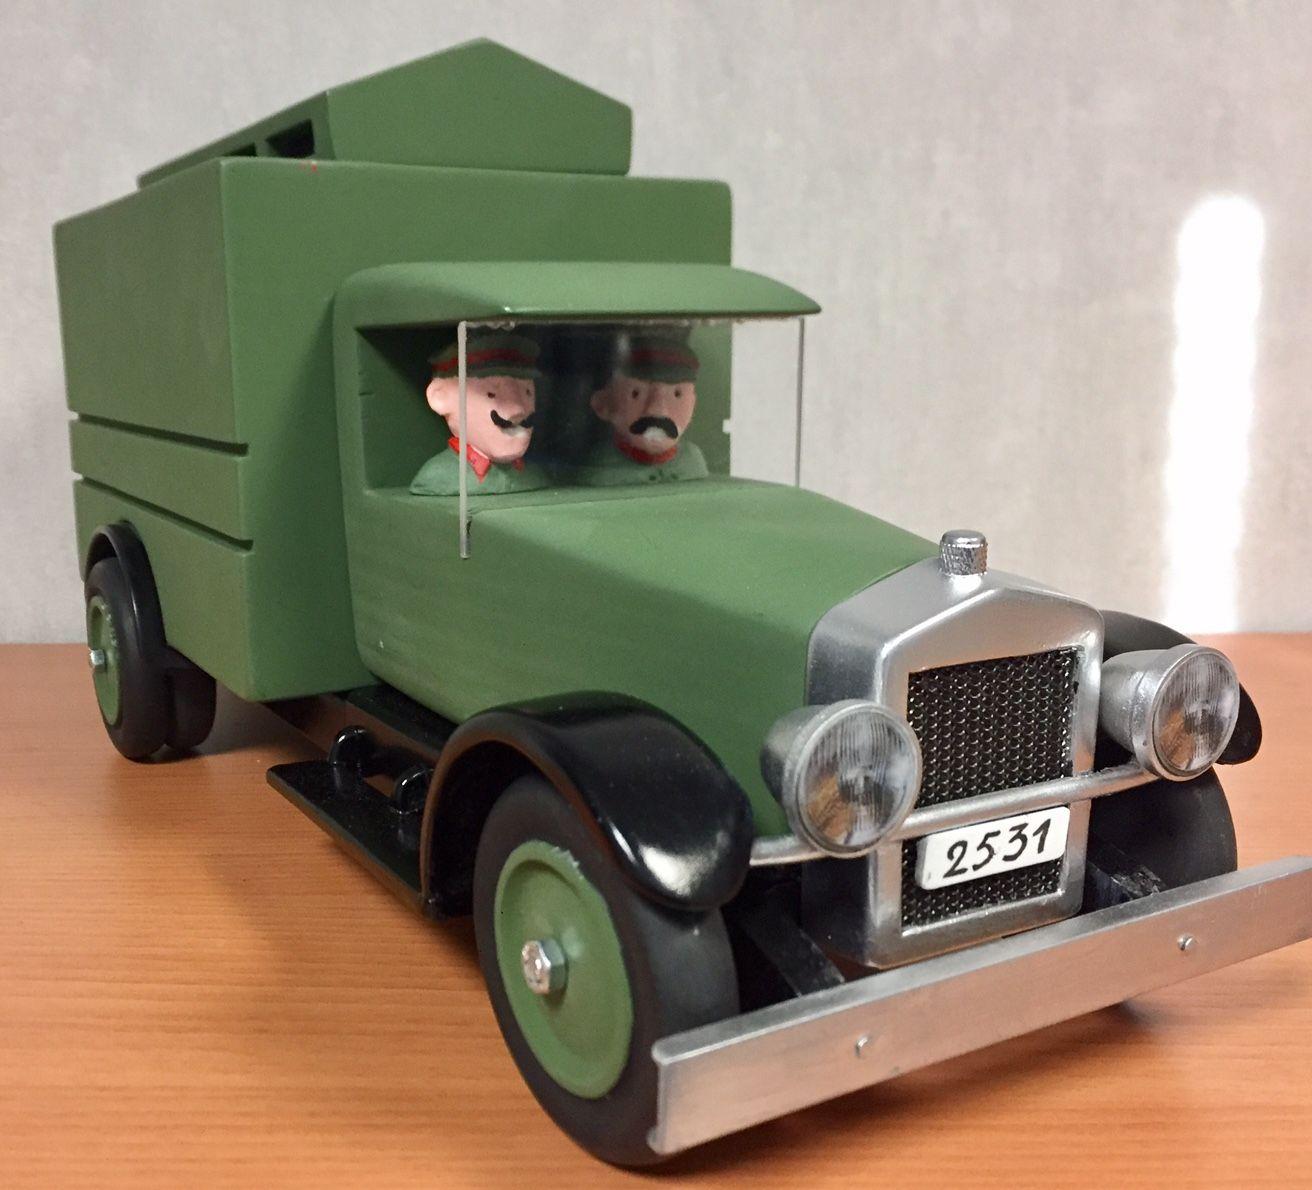 Prisonnier Sceptre Ottokar Prison Transport Tintin Camion hQBrdCtsx